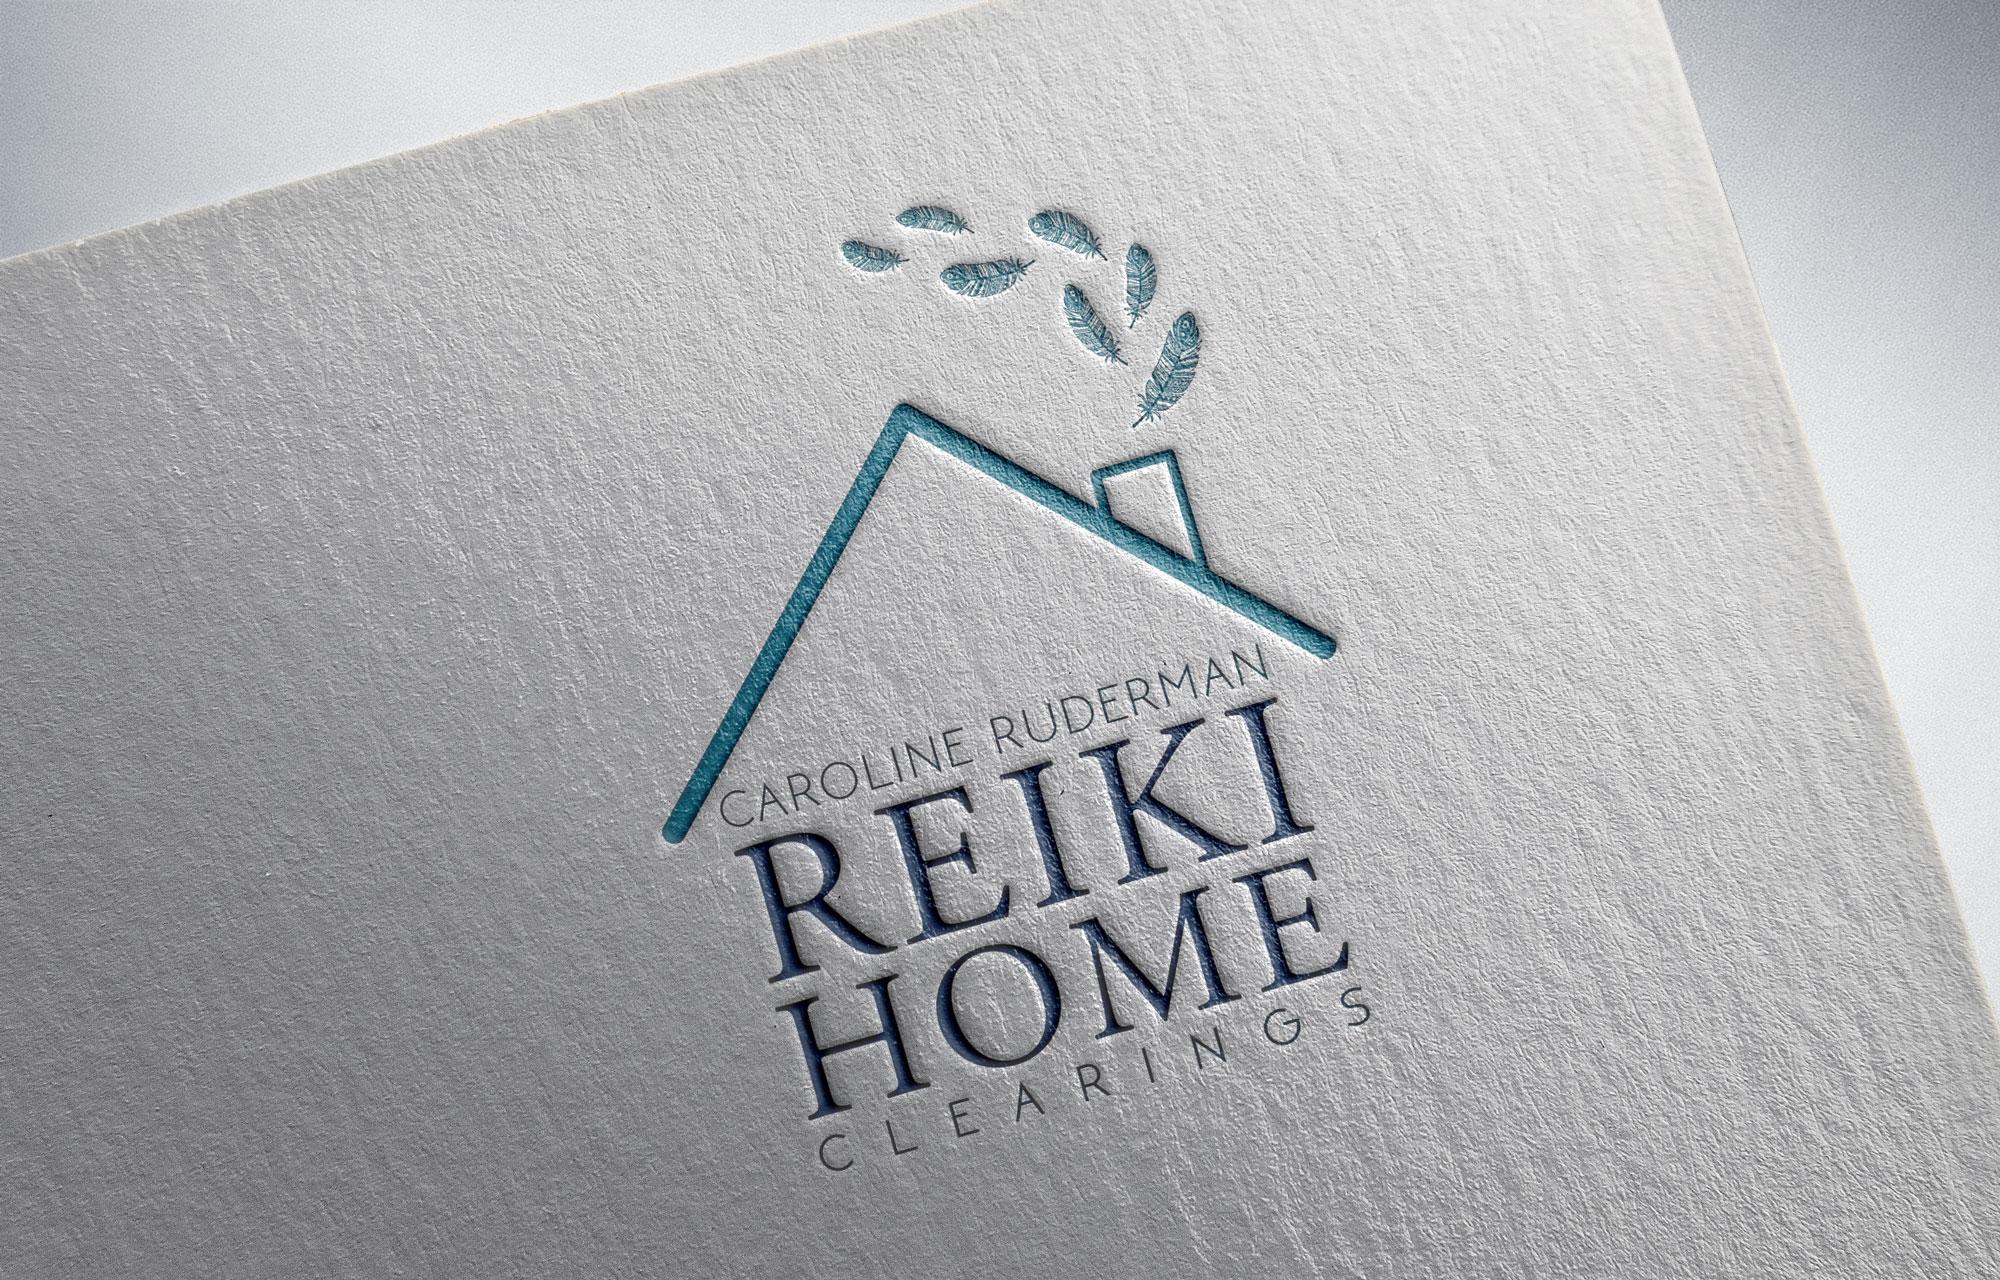 Graphic designer in Northampton, Northampton graphic design, reiki logo, logo designer.